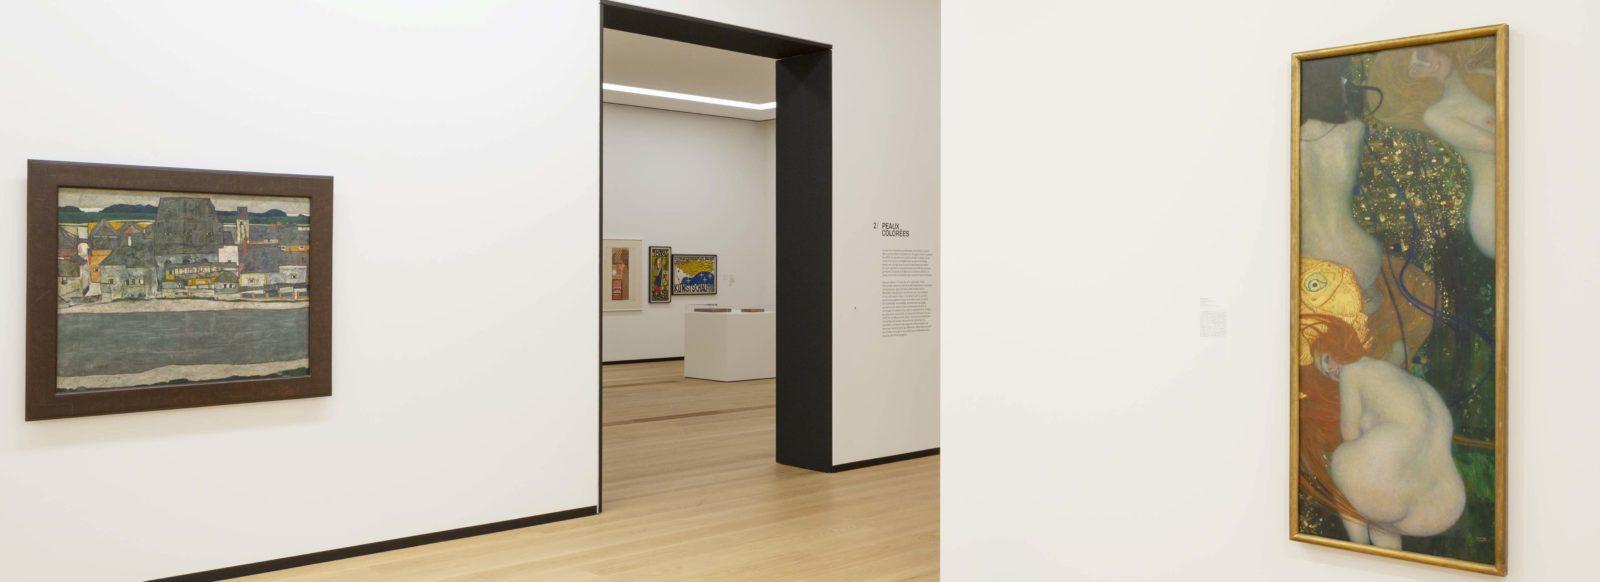 salle d'exposition MCBA Lausanne : © Etienne Malapert/MCBA